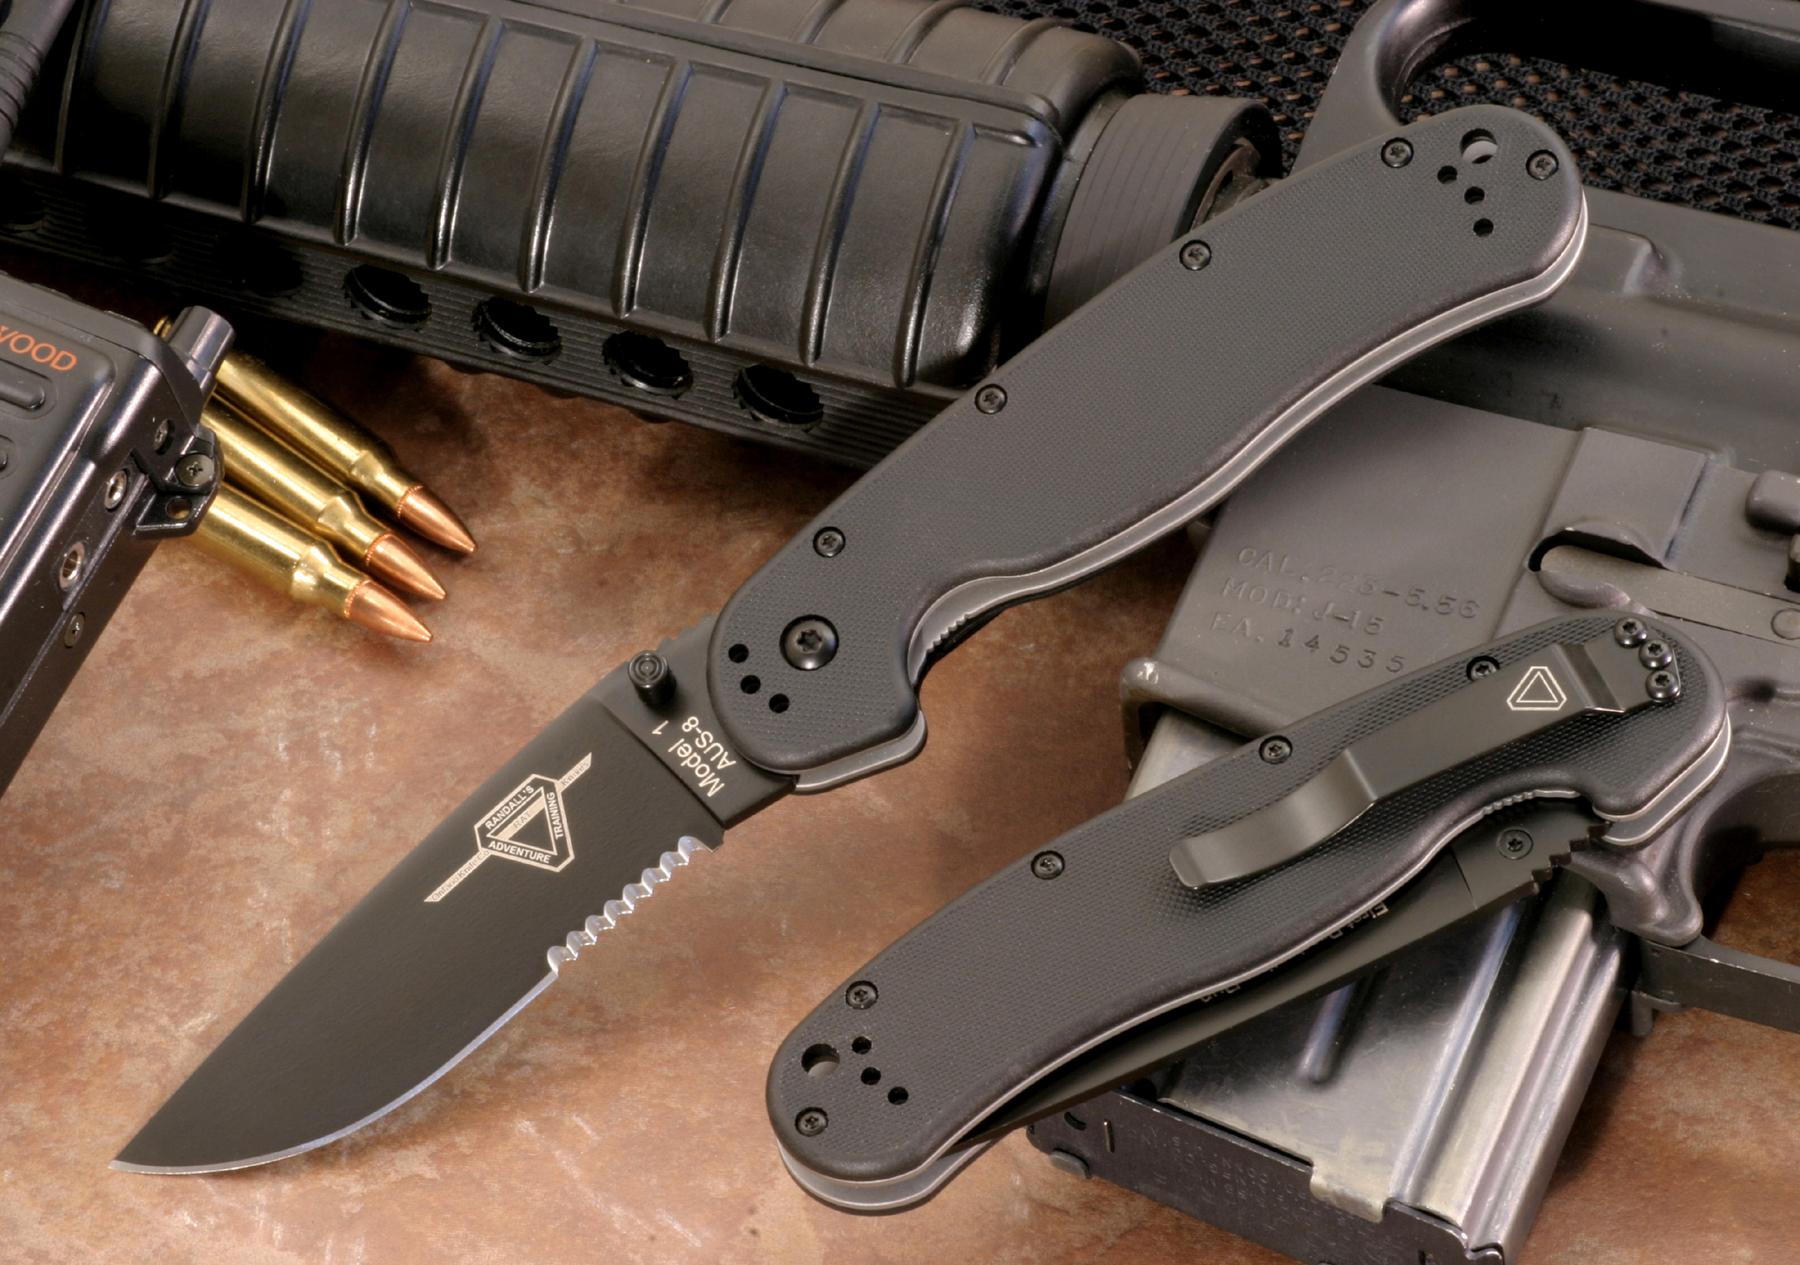 Ontario 8848 RAT – edc knife